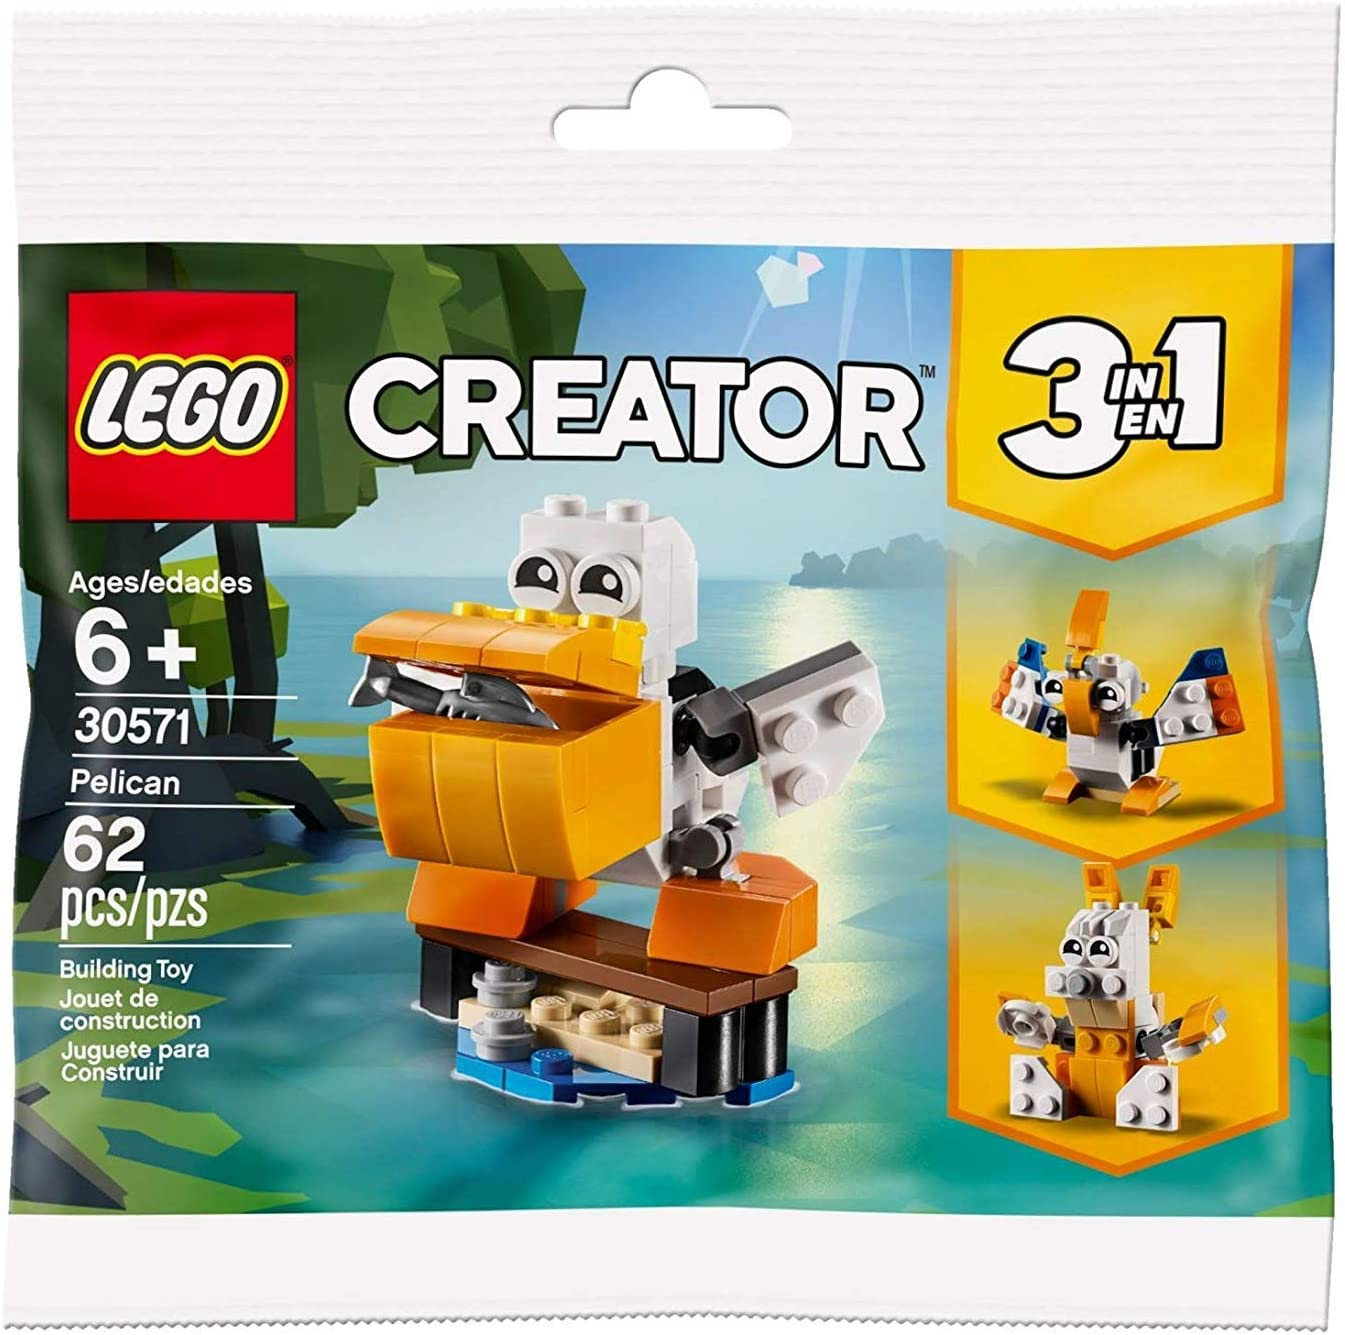 Lego Creator Polybag 30571 Pelican 62pcs New Sealed 2019